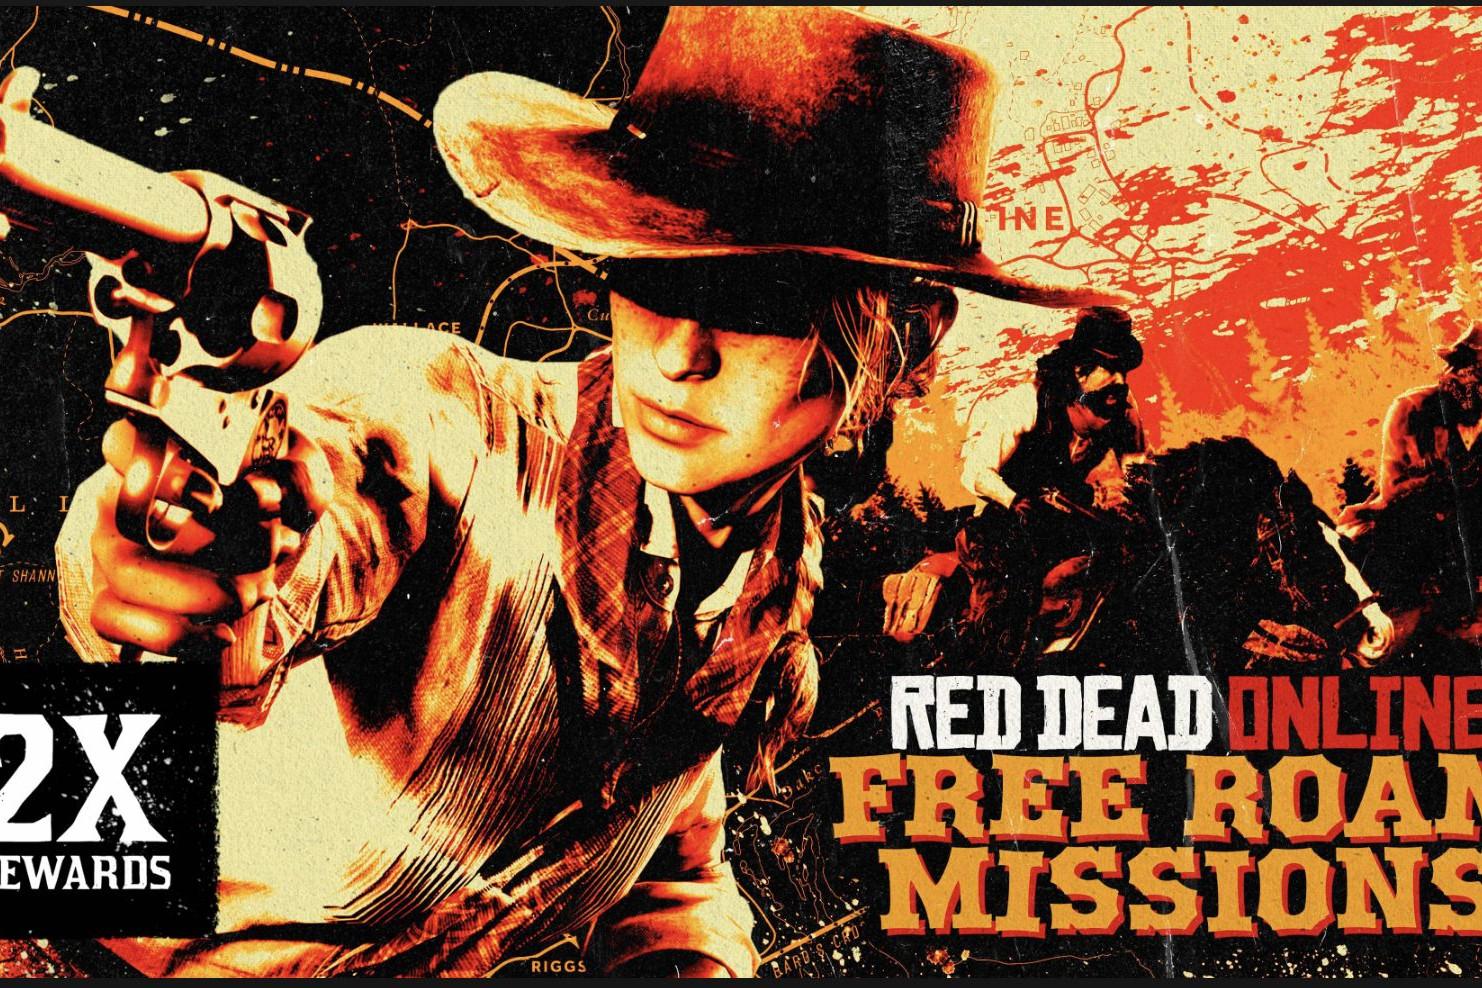 Red Dead Online Mission Mode Libre